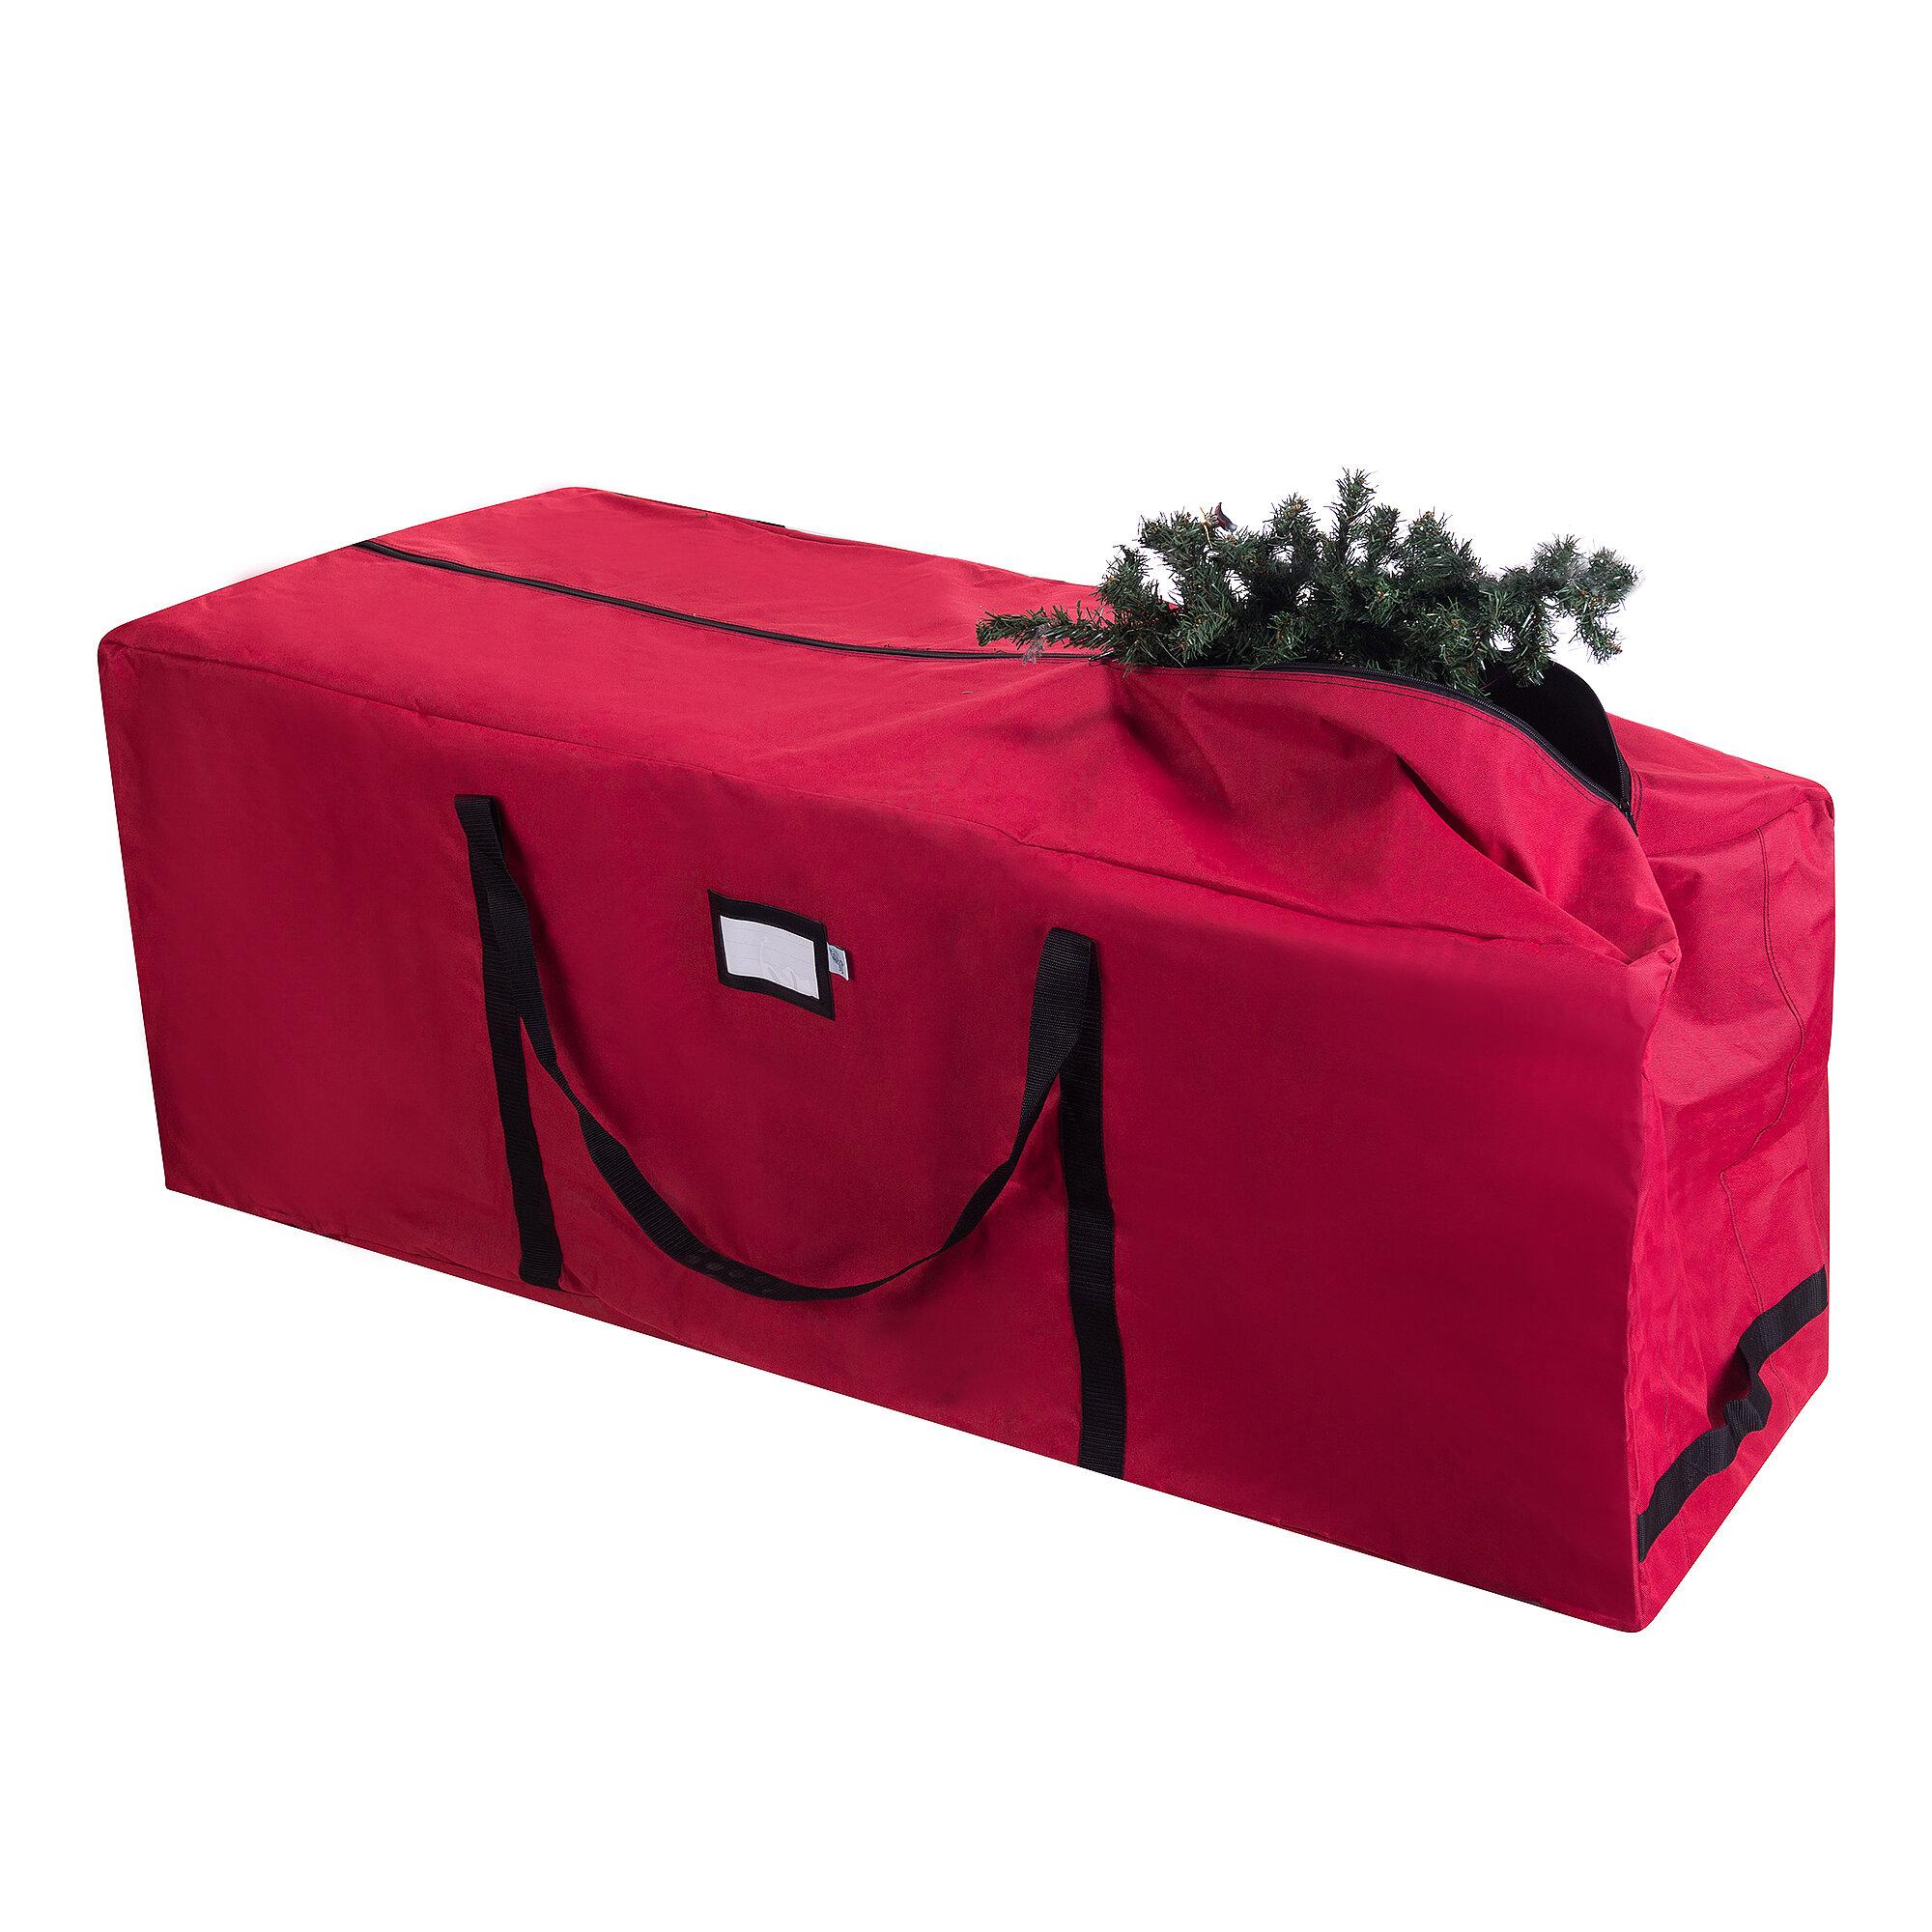 Superbe The Holiday Aisle Rolling Christmas Tree Storage Bag U0026 Reviews | Wayfair